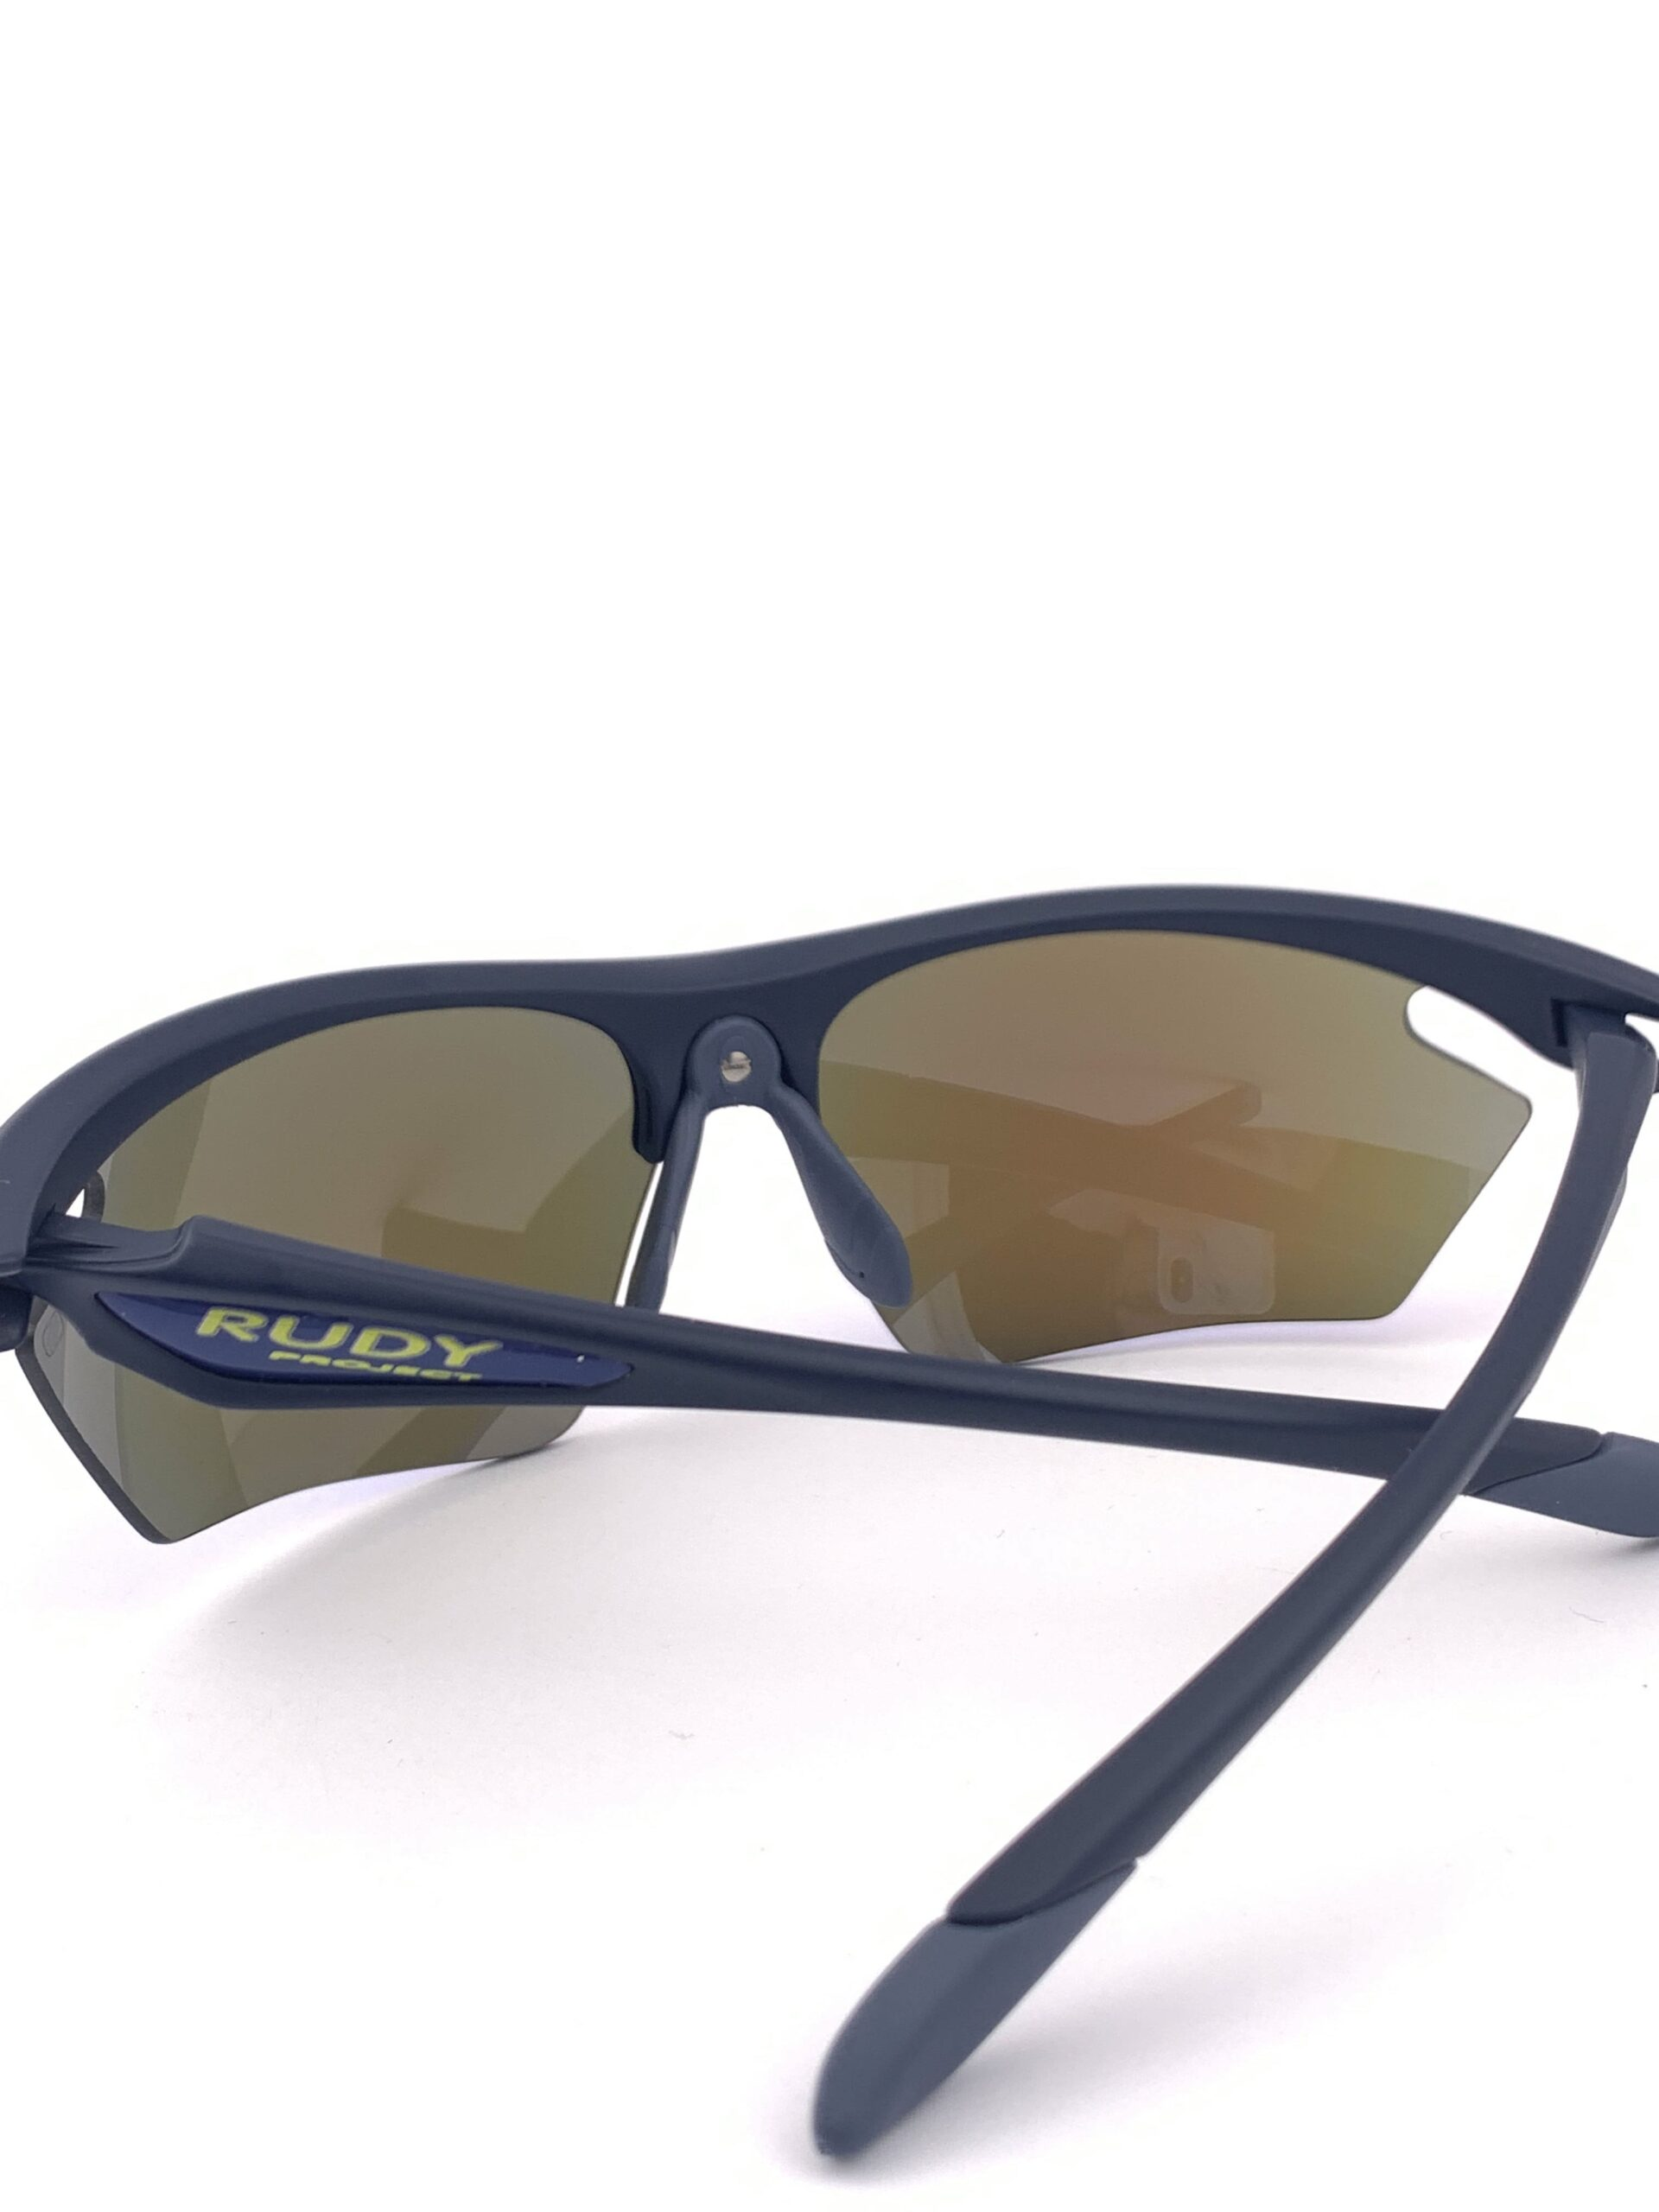 Okuliare na bicykel Stratofly